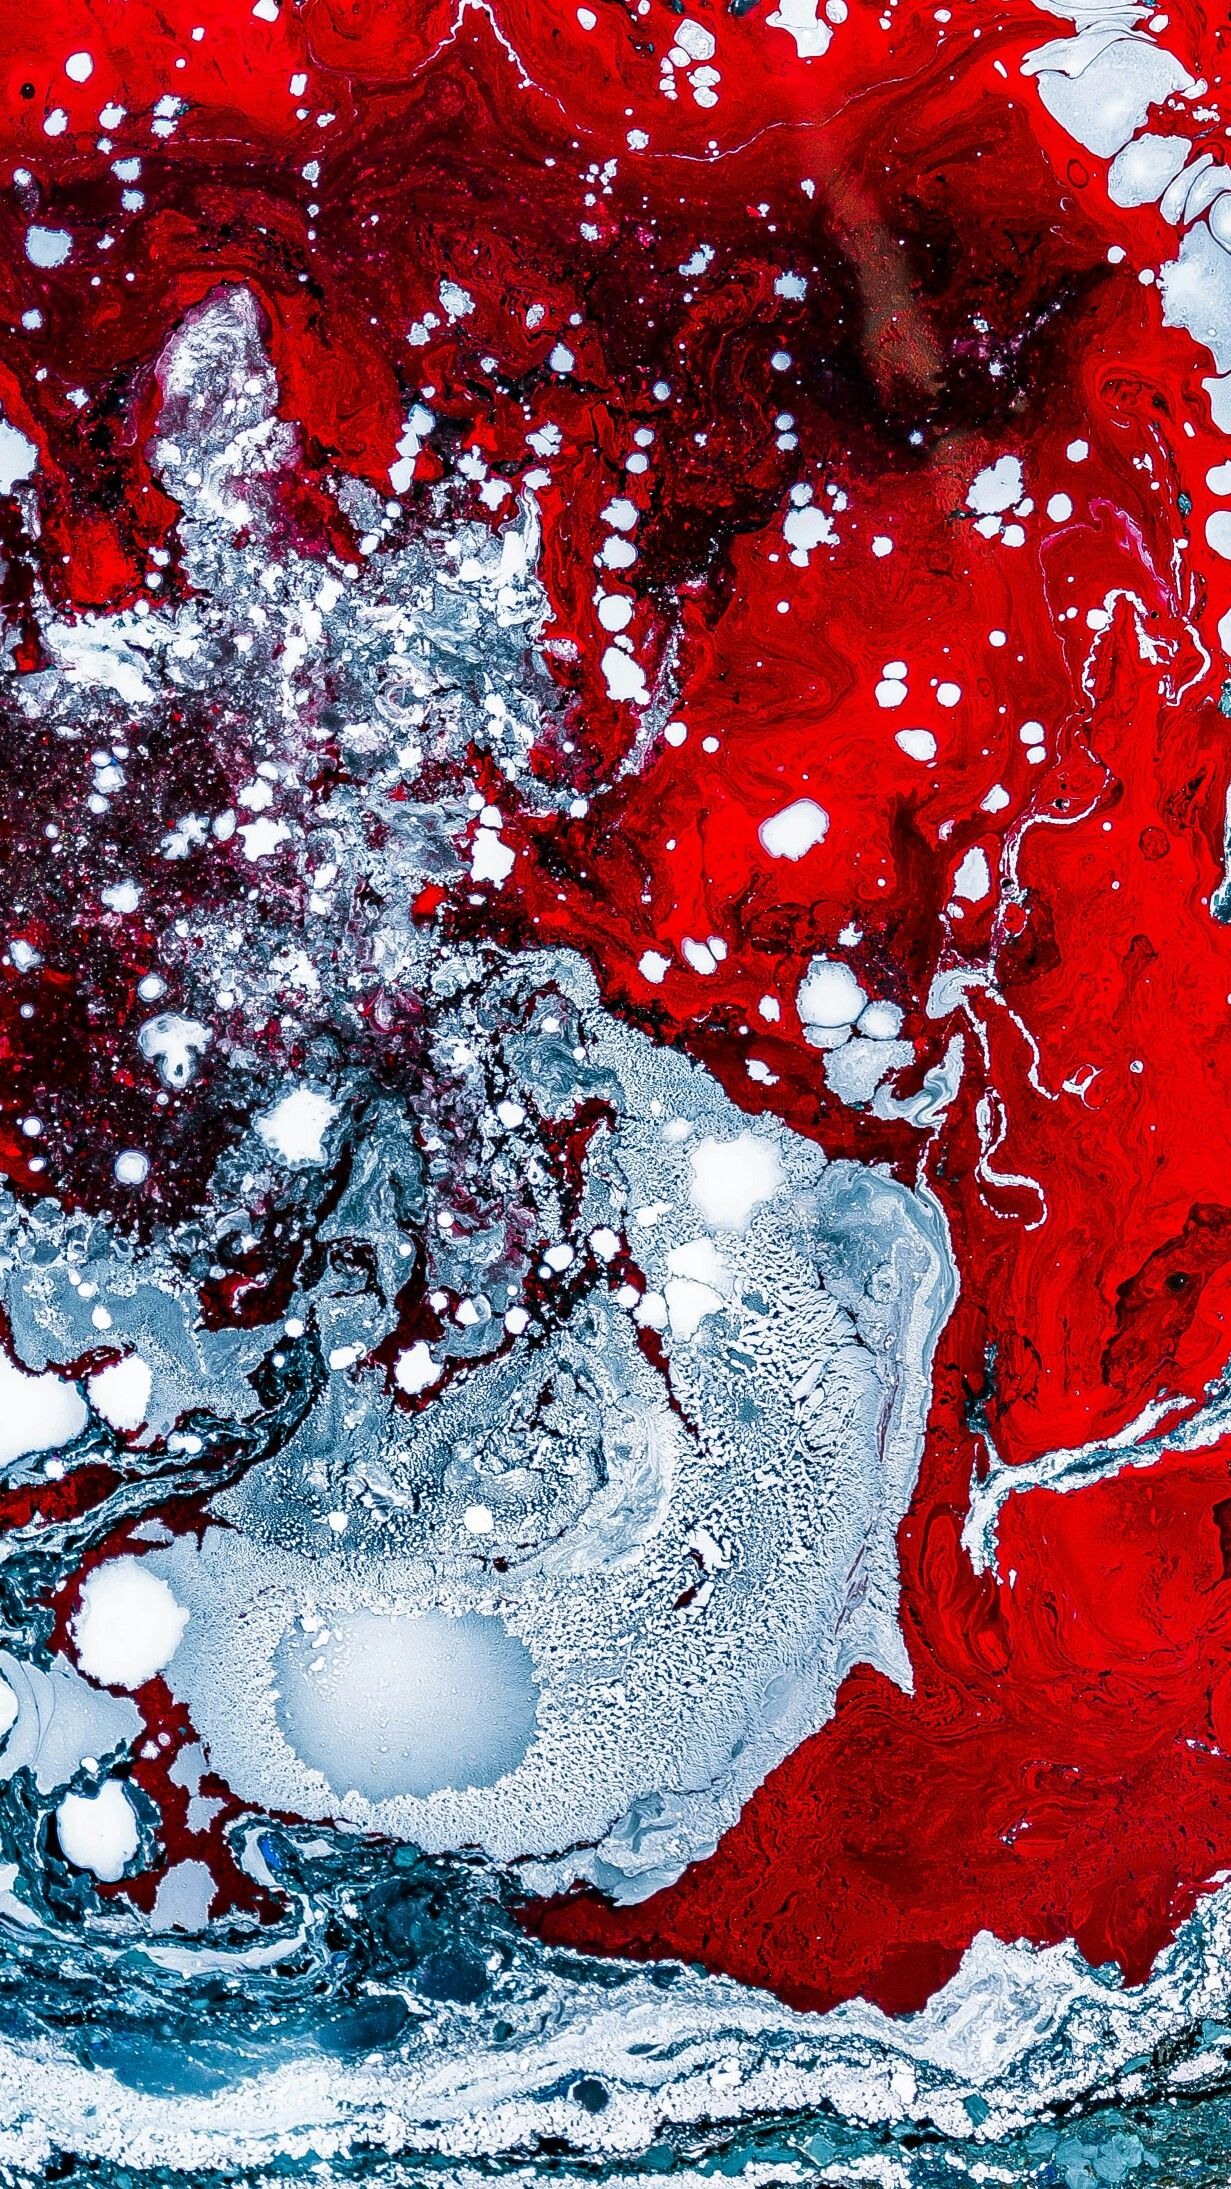 Red Rosso Rouge Rojo Rød 赤 Vermelho Maroon